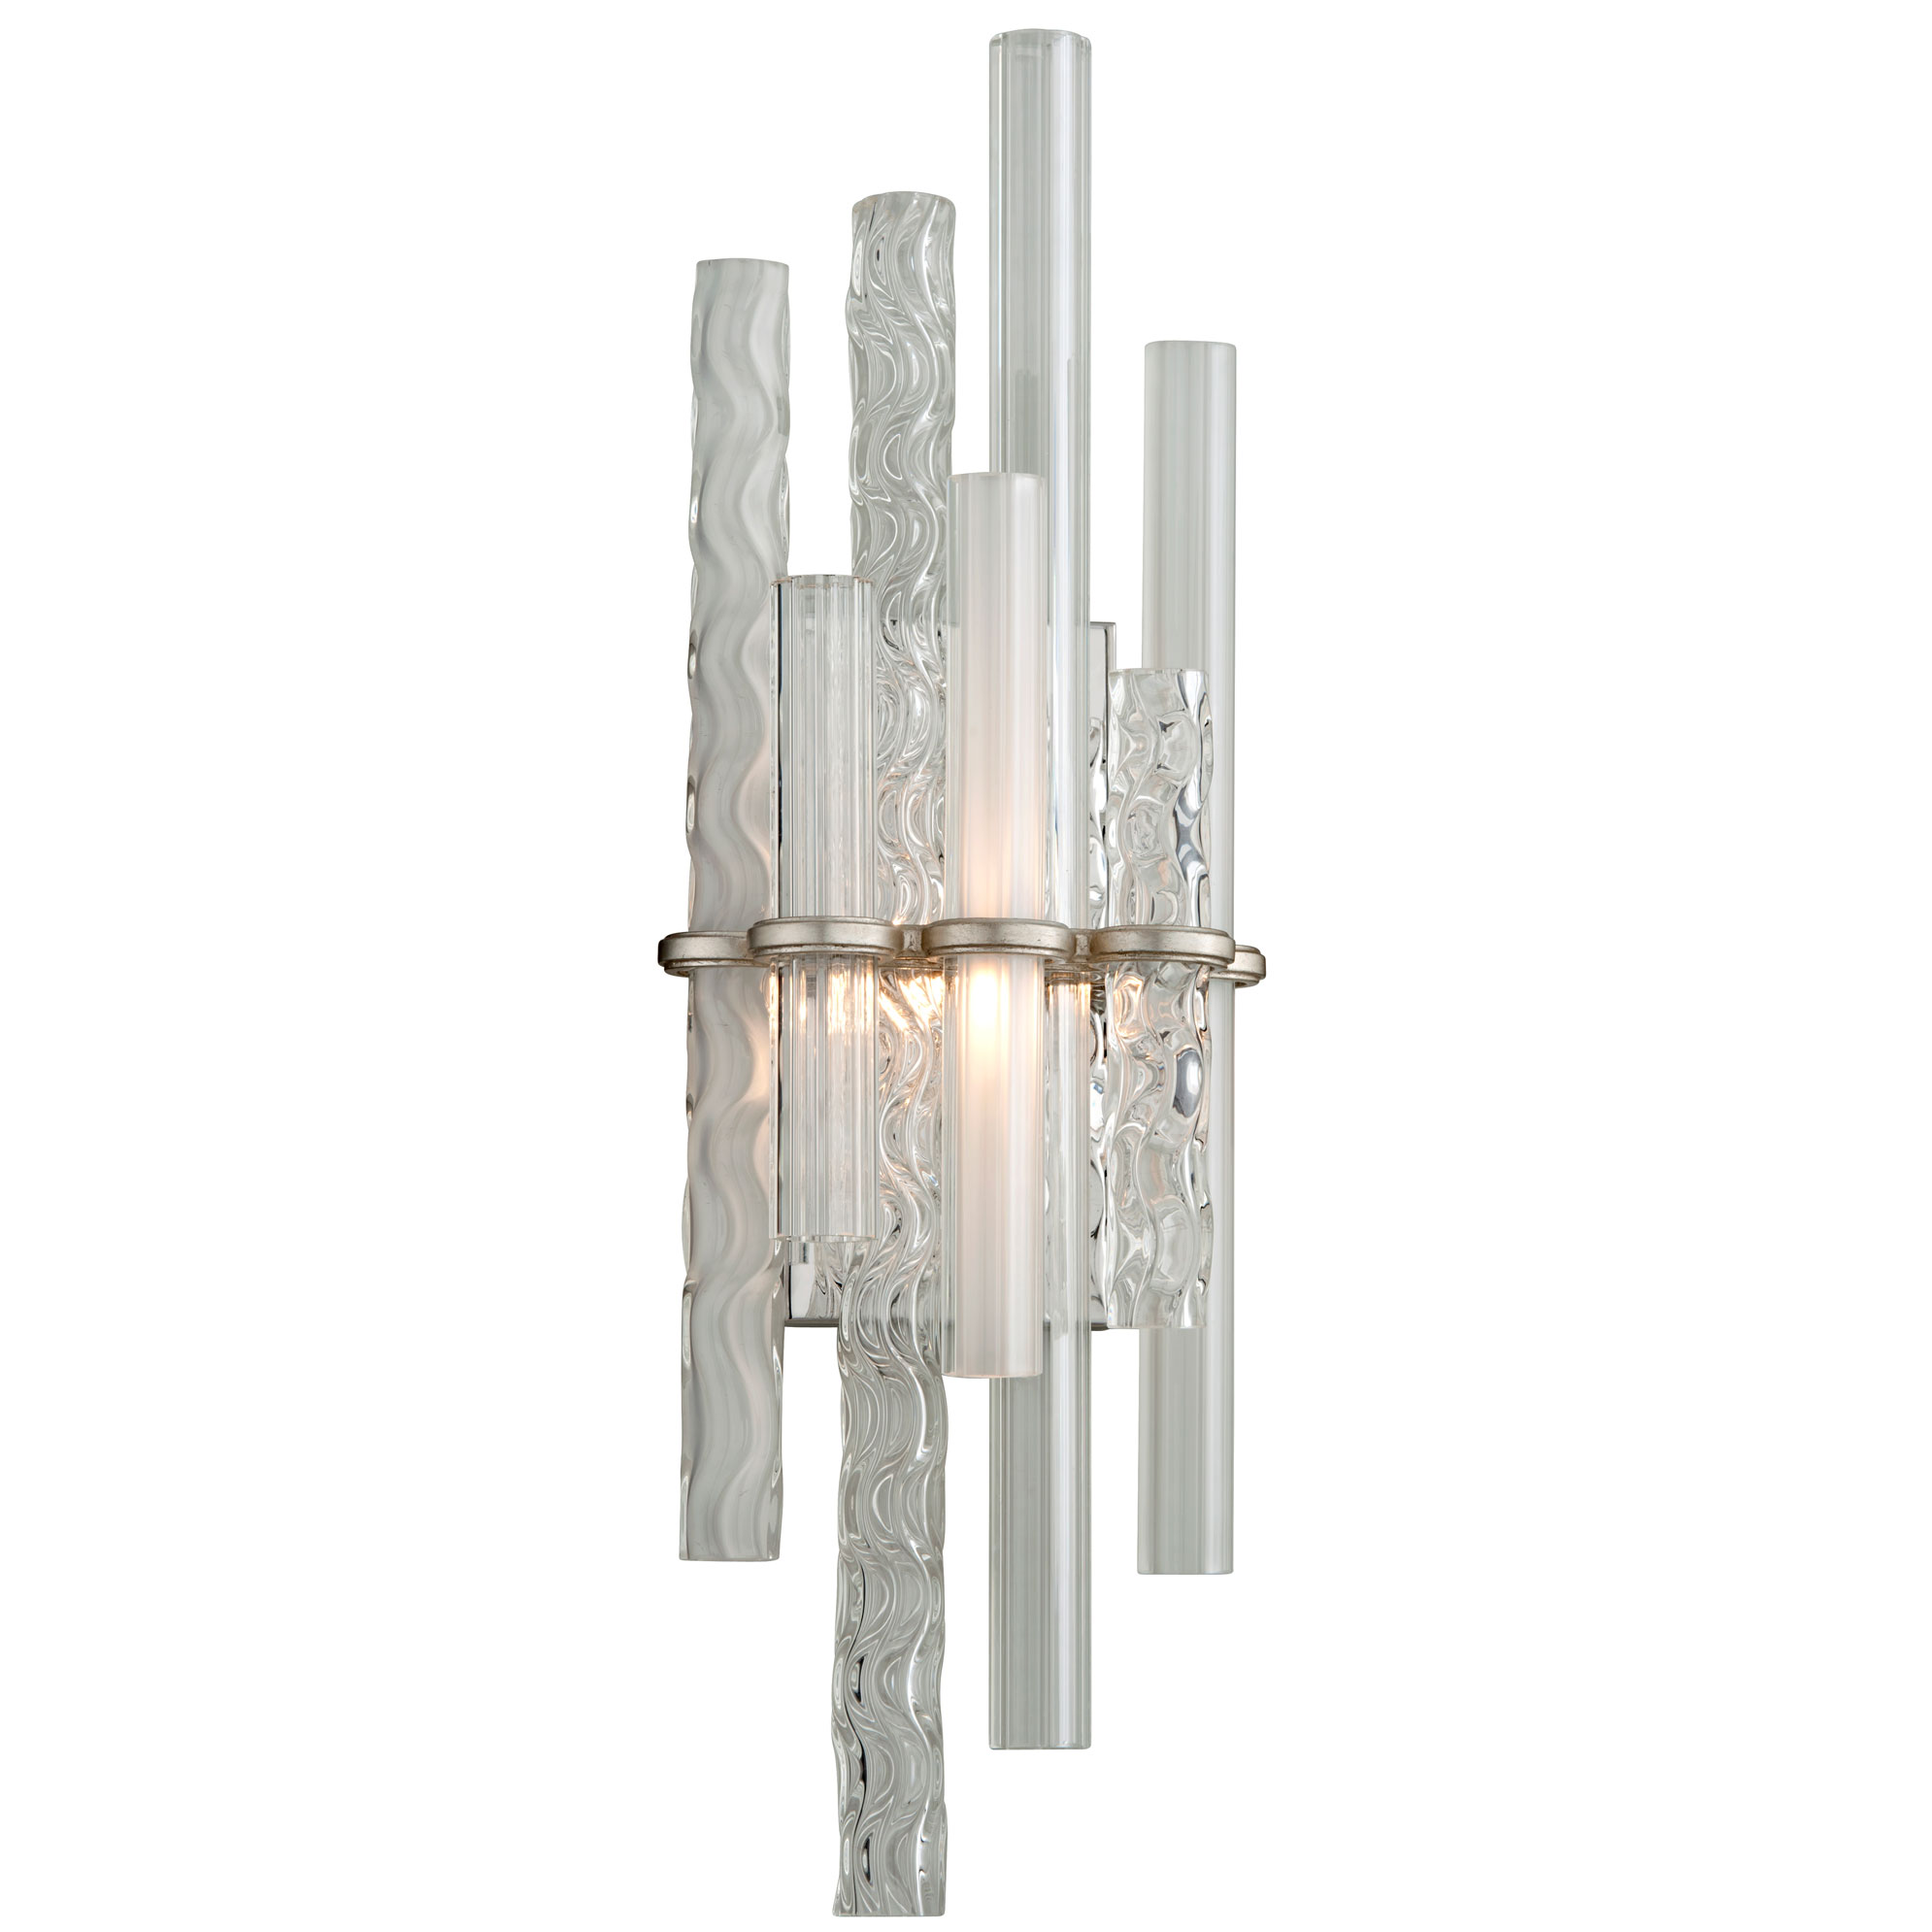 Manhattan Wall Light By Corbett Lighting 219 11